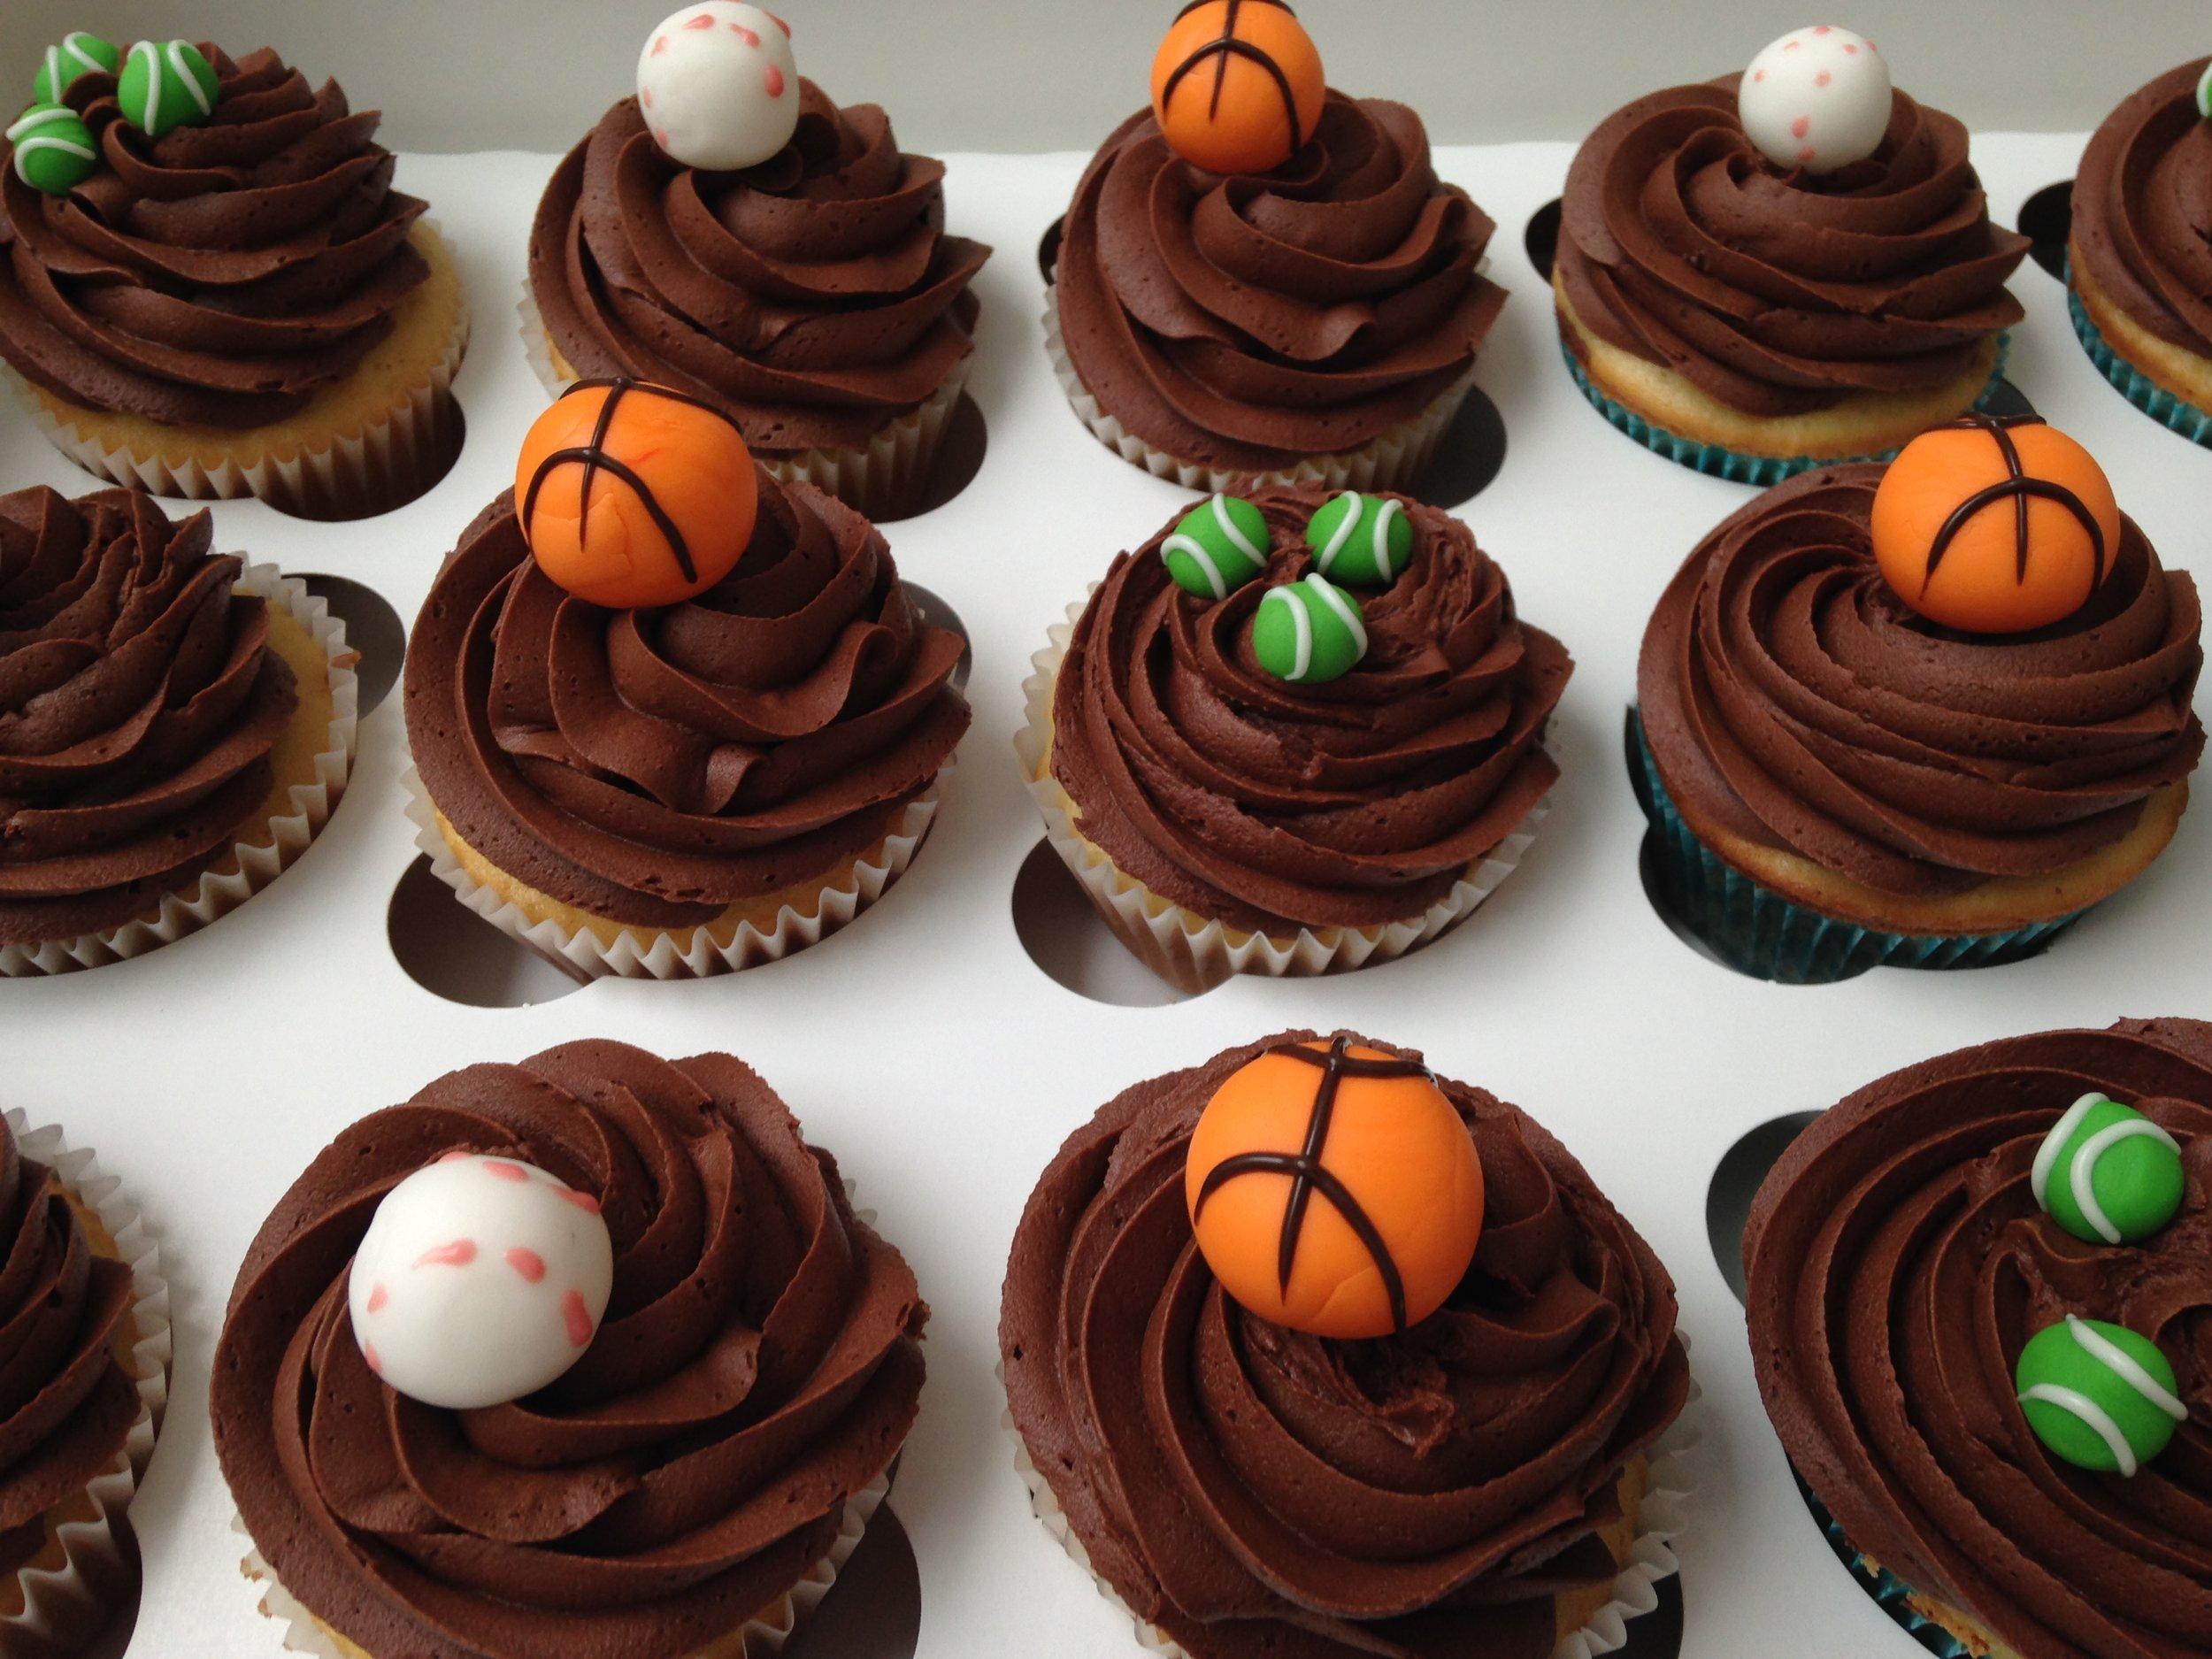 sportscupcakes2.jpg